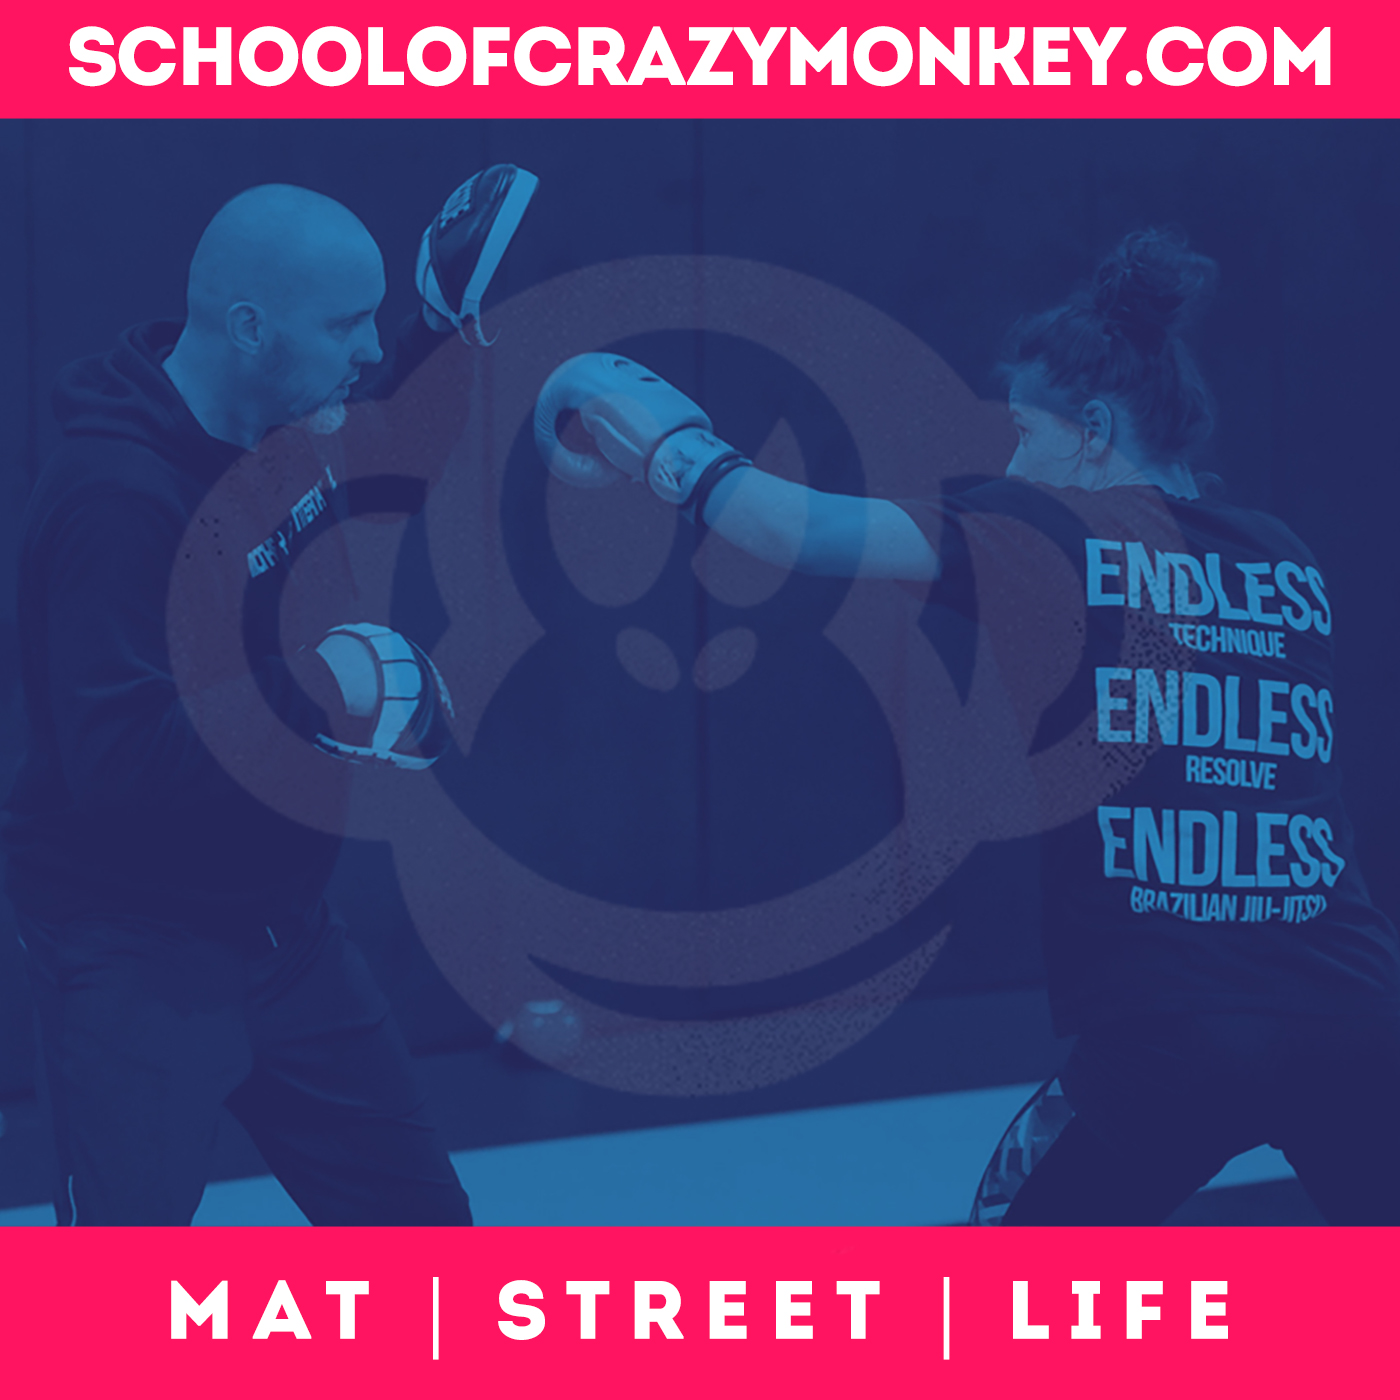 Show artwork for School of Crazy Monkey